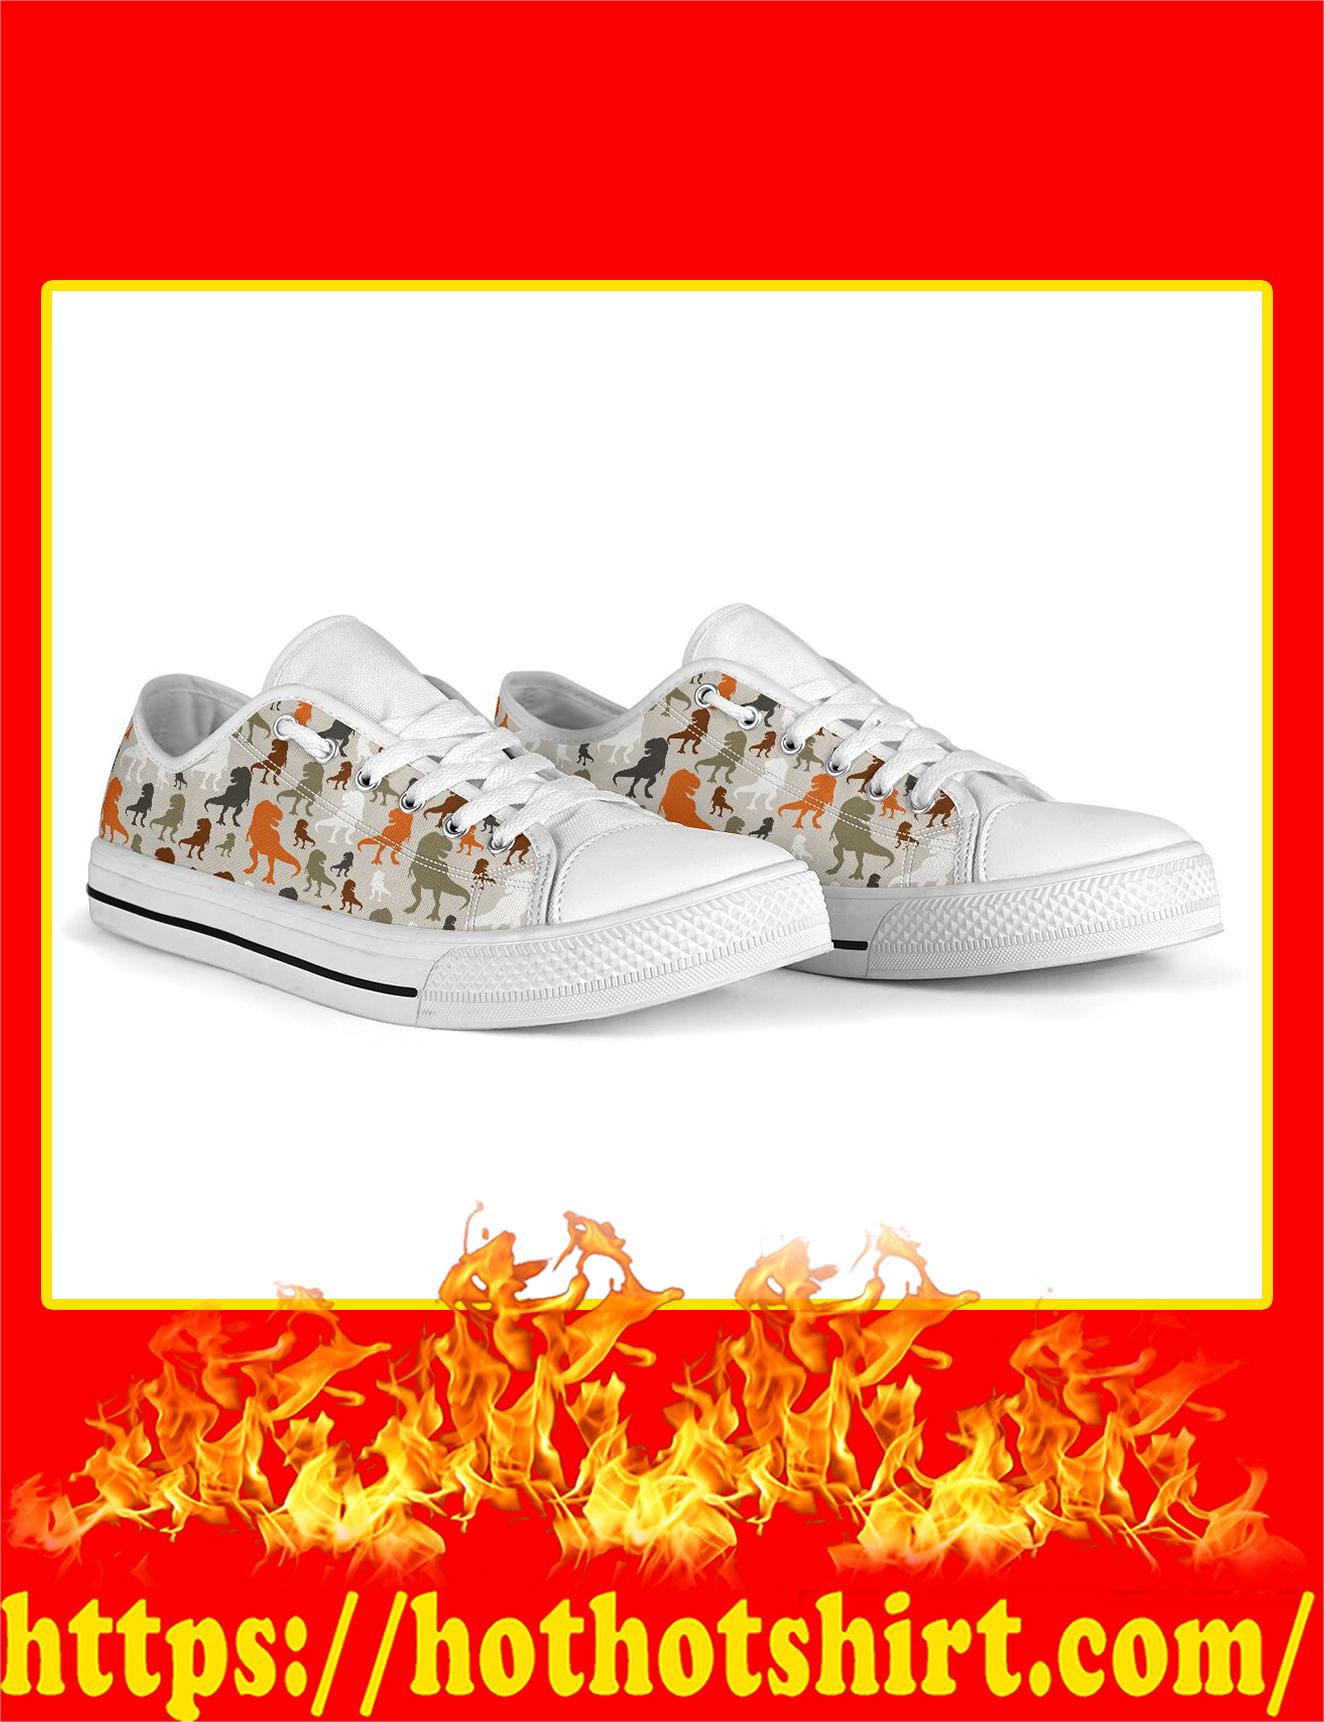 T Rex Low Top Shoes - Pic 1